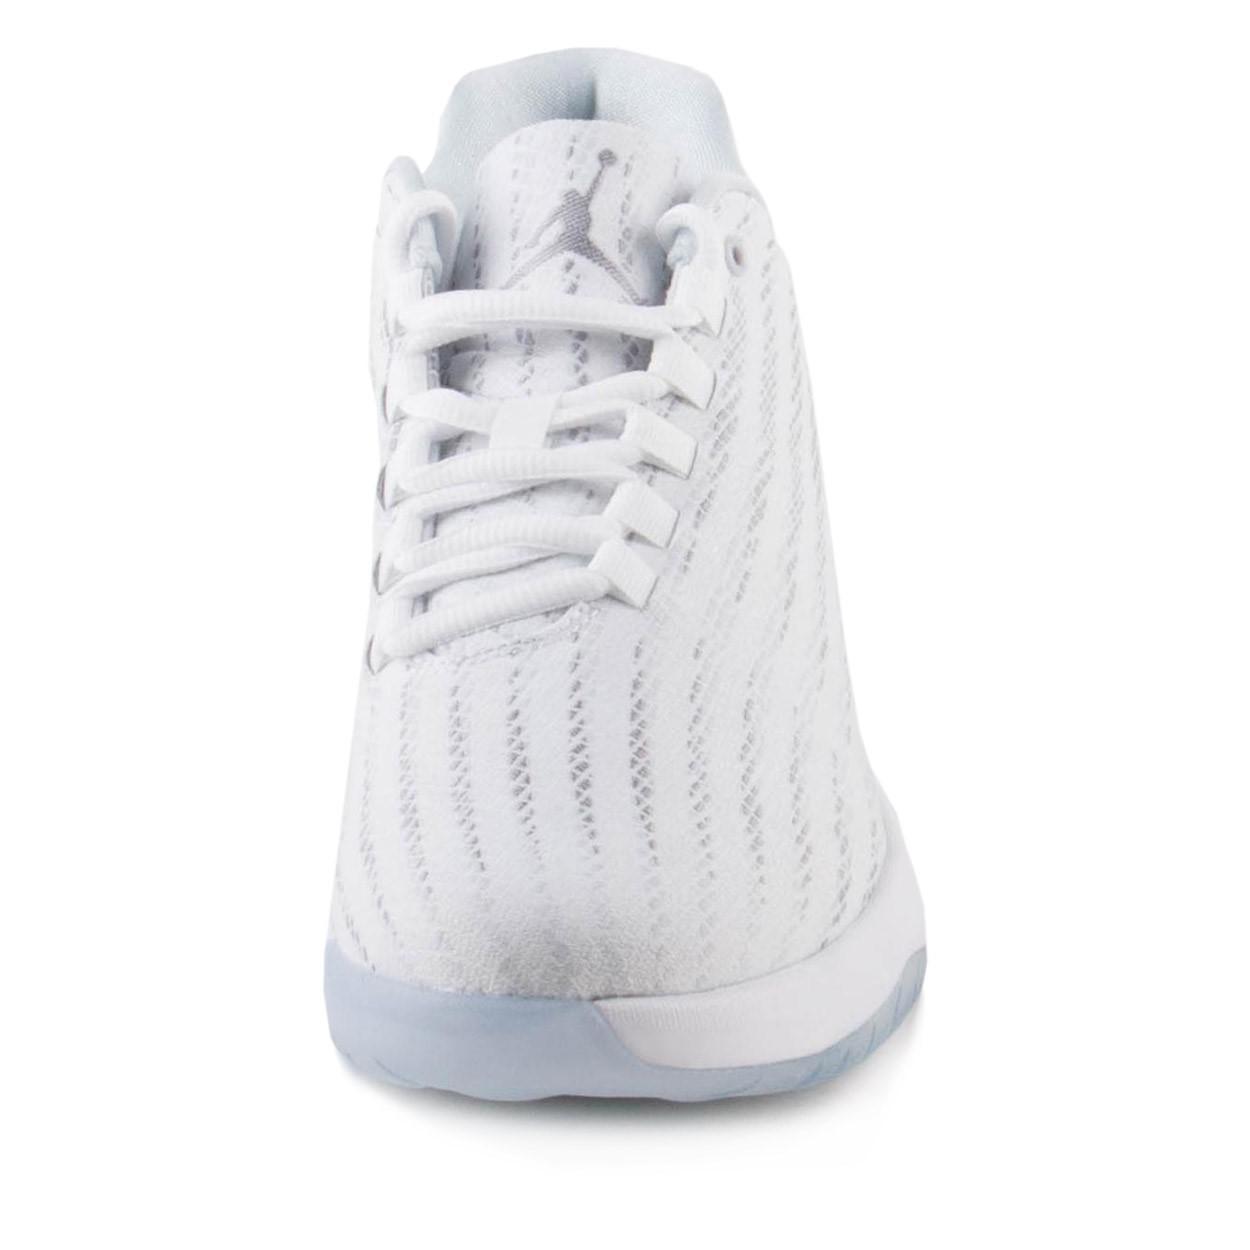 58184dc5fab1 Lyst - Nike Mens Jordan B. Fly White grey 881444-100 Size 9.5 in ...